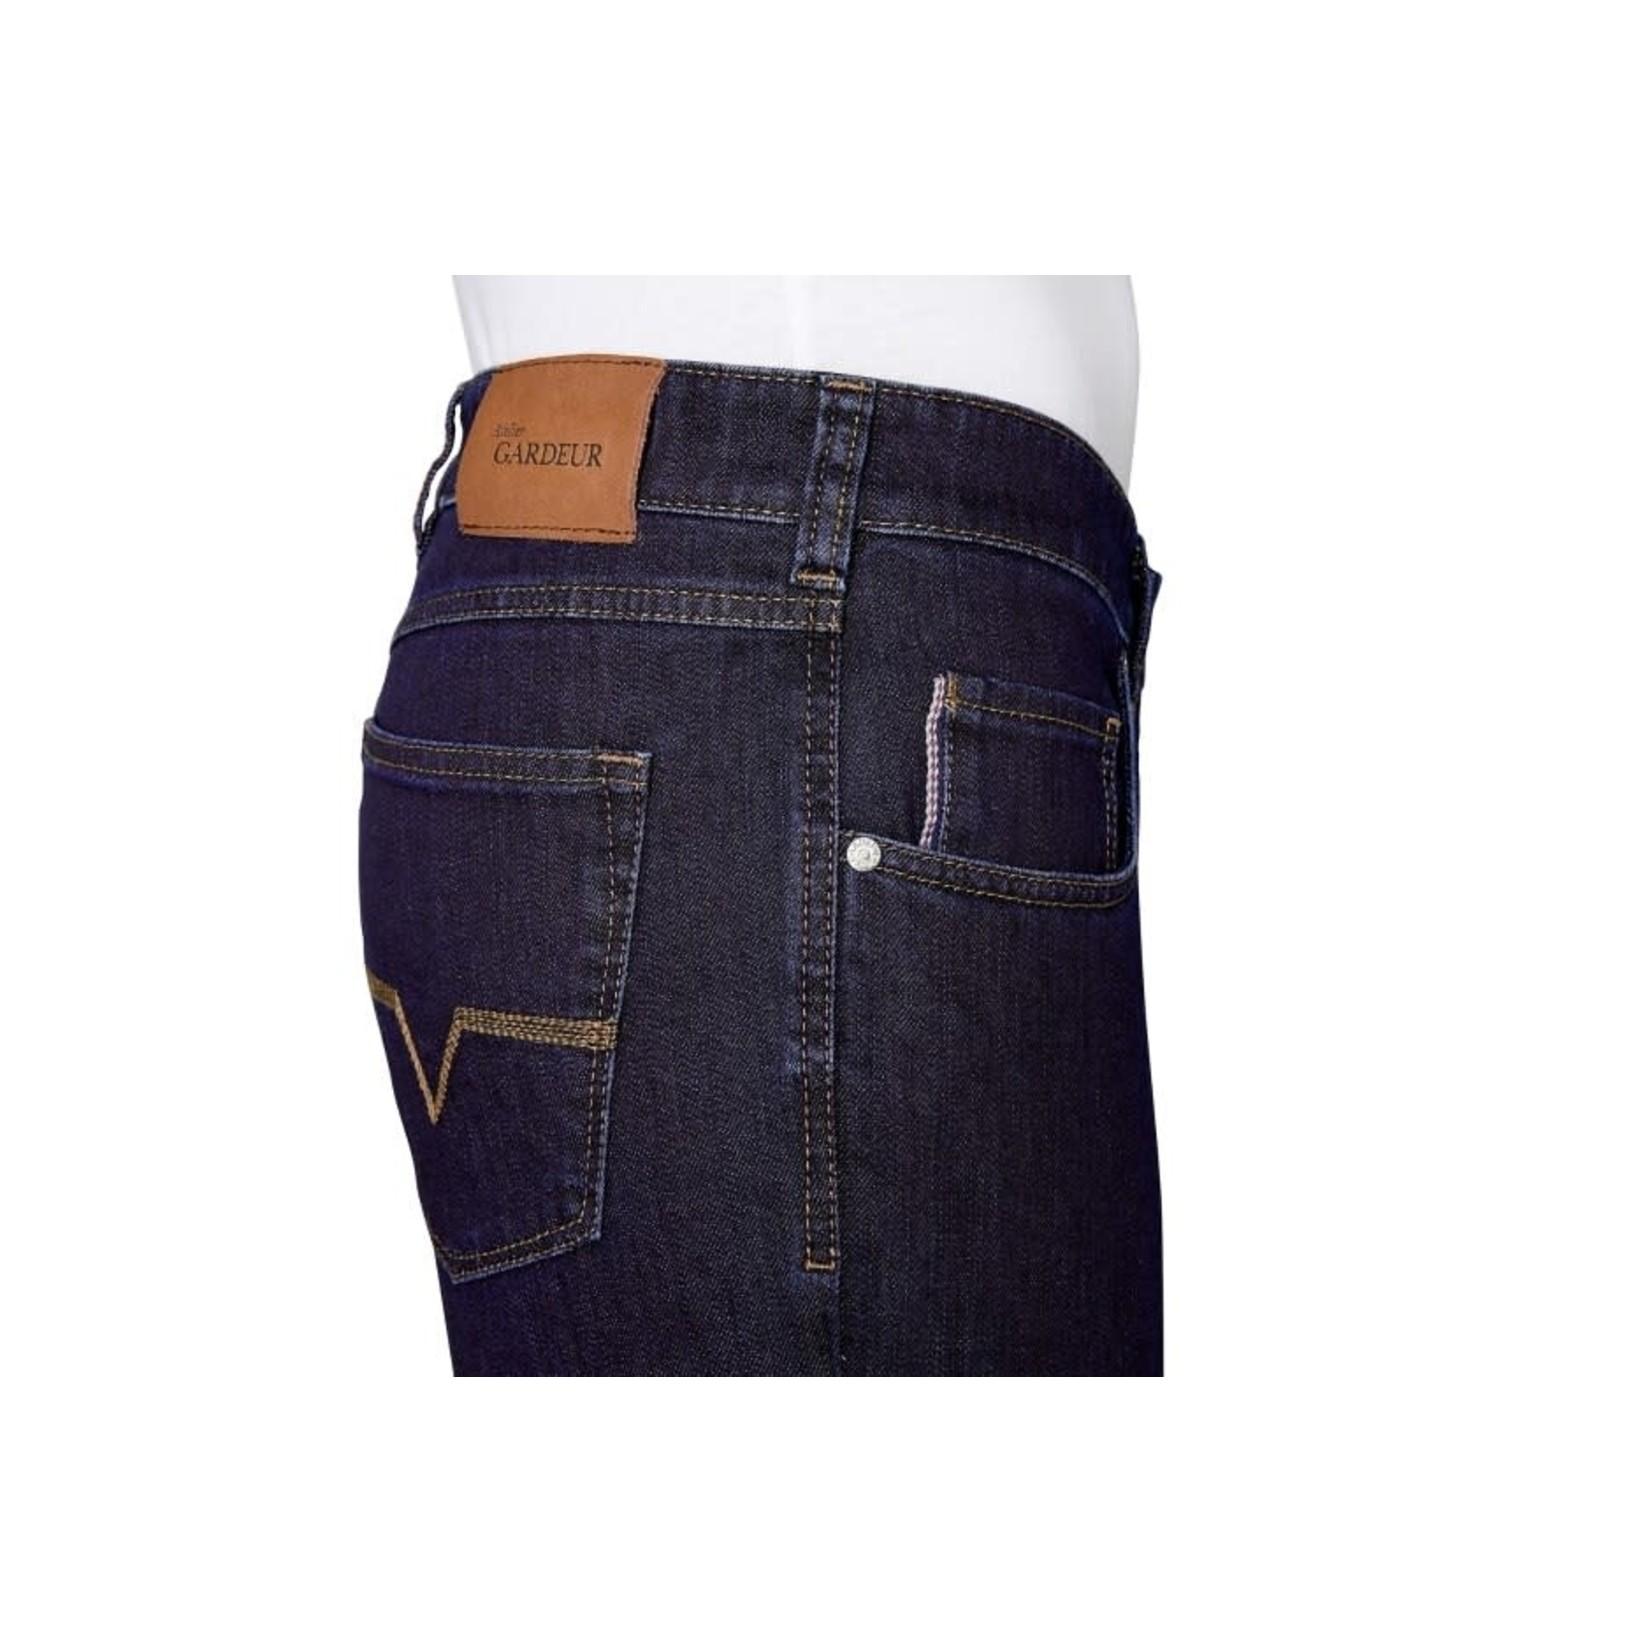 Gardeur Nevio-11 regular fit jeans marine 470181-169